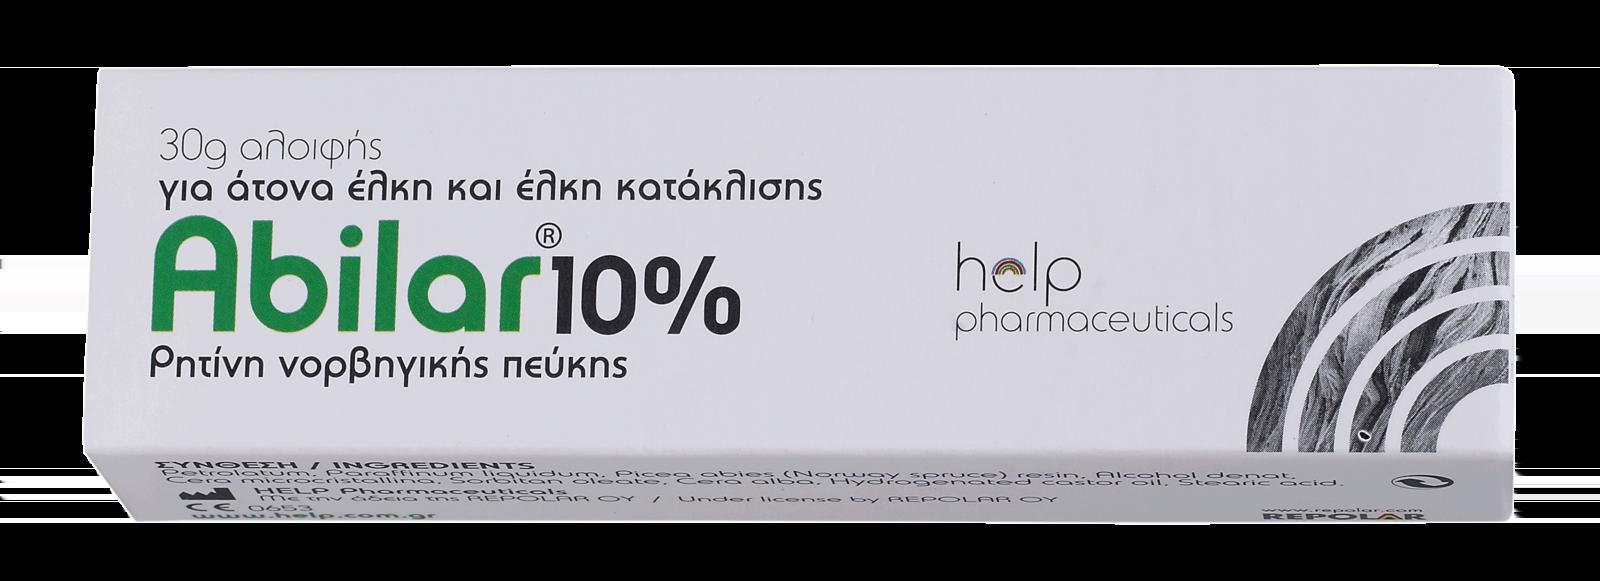 Help Pharmaceuticals Abilar 10% Επουλωτική Αλοιφή, 30gr